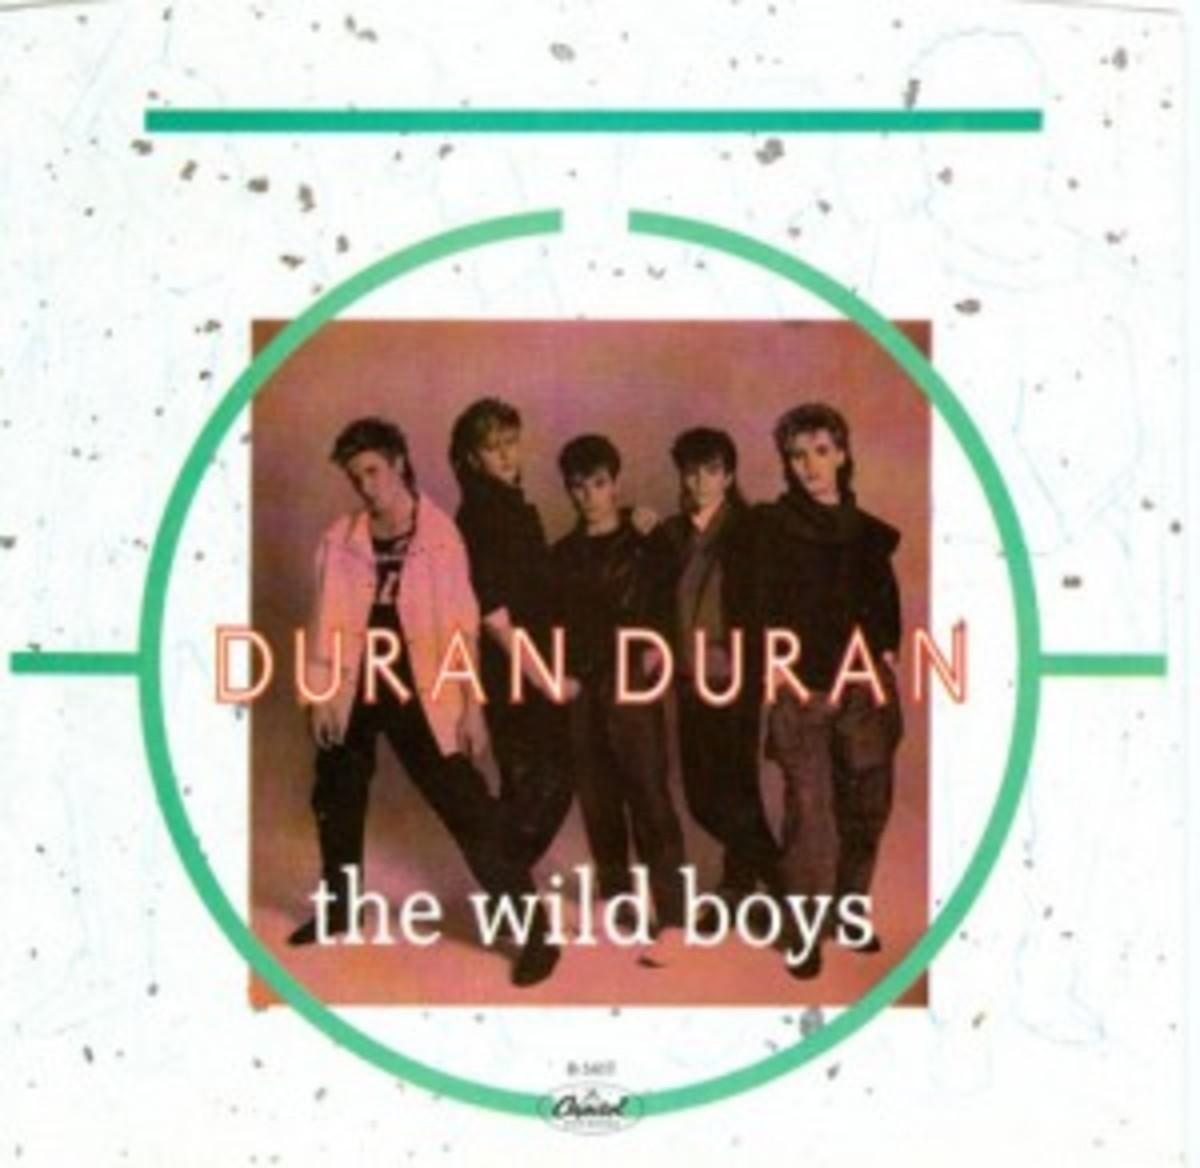 Duran Duran The Wild Boys picture sleeve